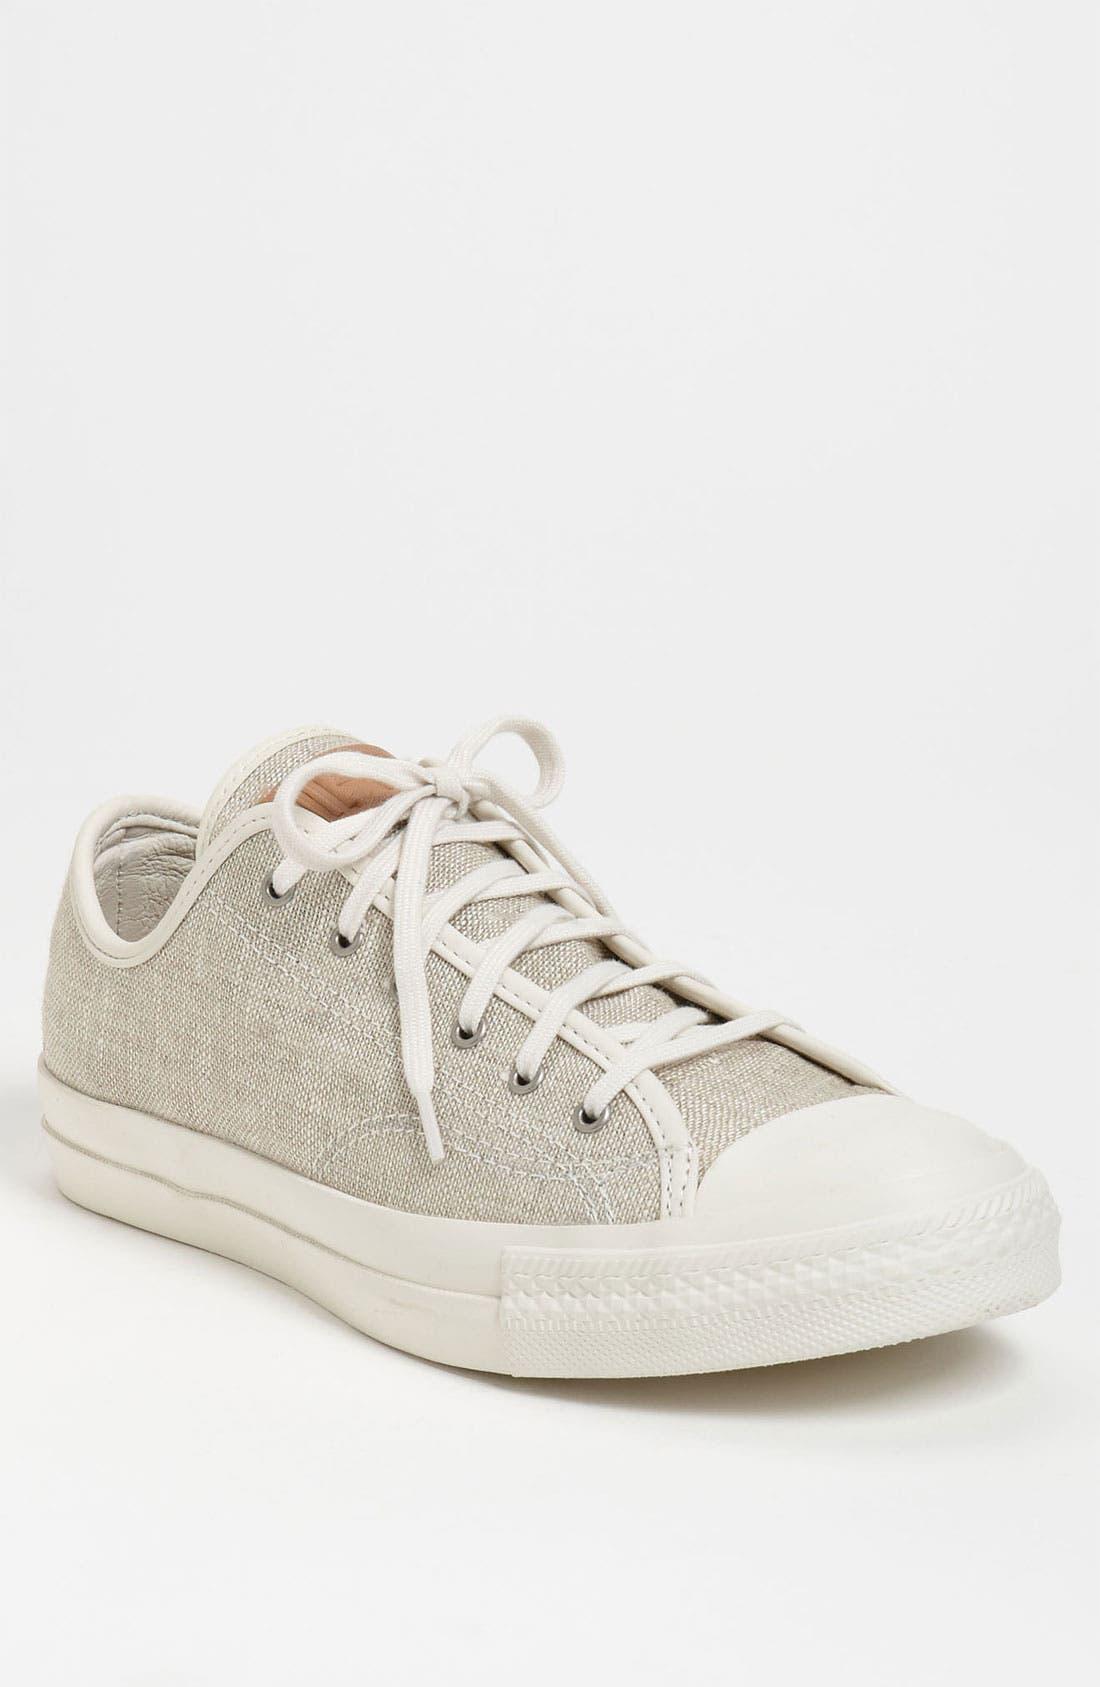 Main Image - Converse Chuck Taylor® 'Premium' Low Sneaker (Men) (Online Only)